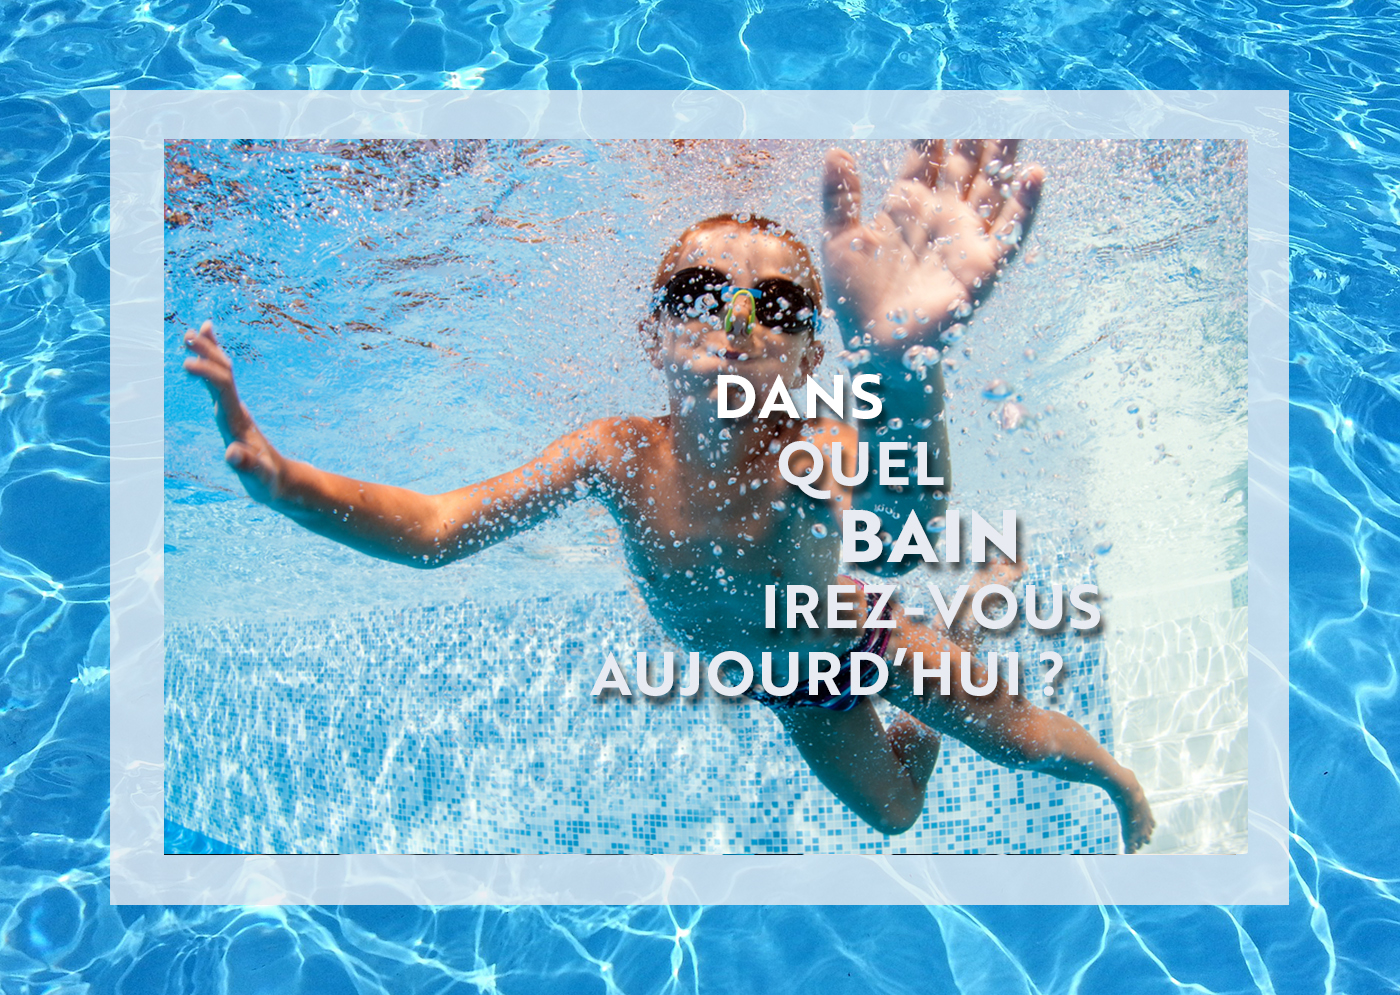 Le d me saint germain en laye piscine intercommunale - Horaires piscine st germain en laye ...